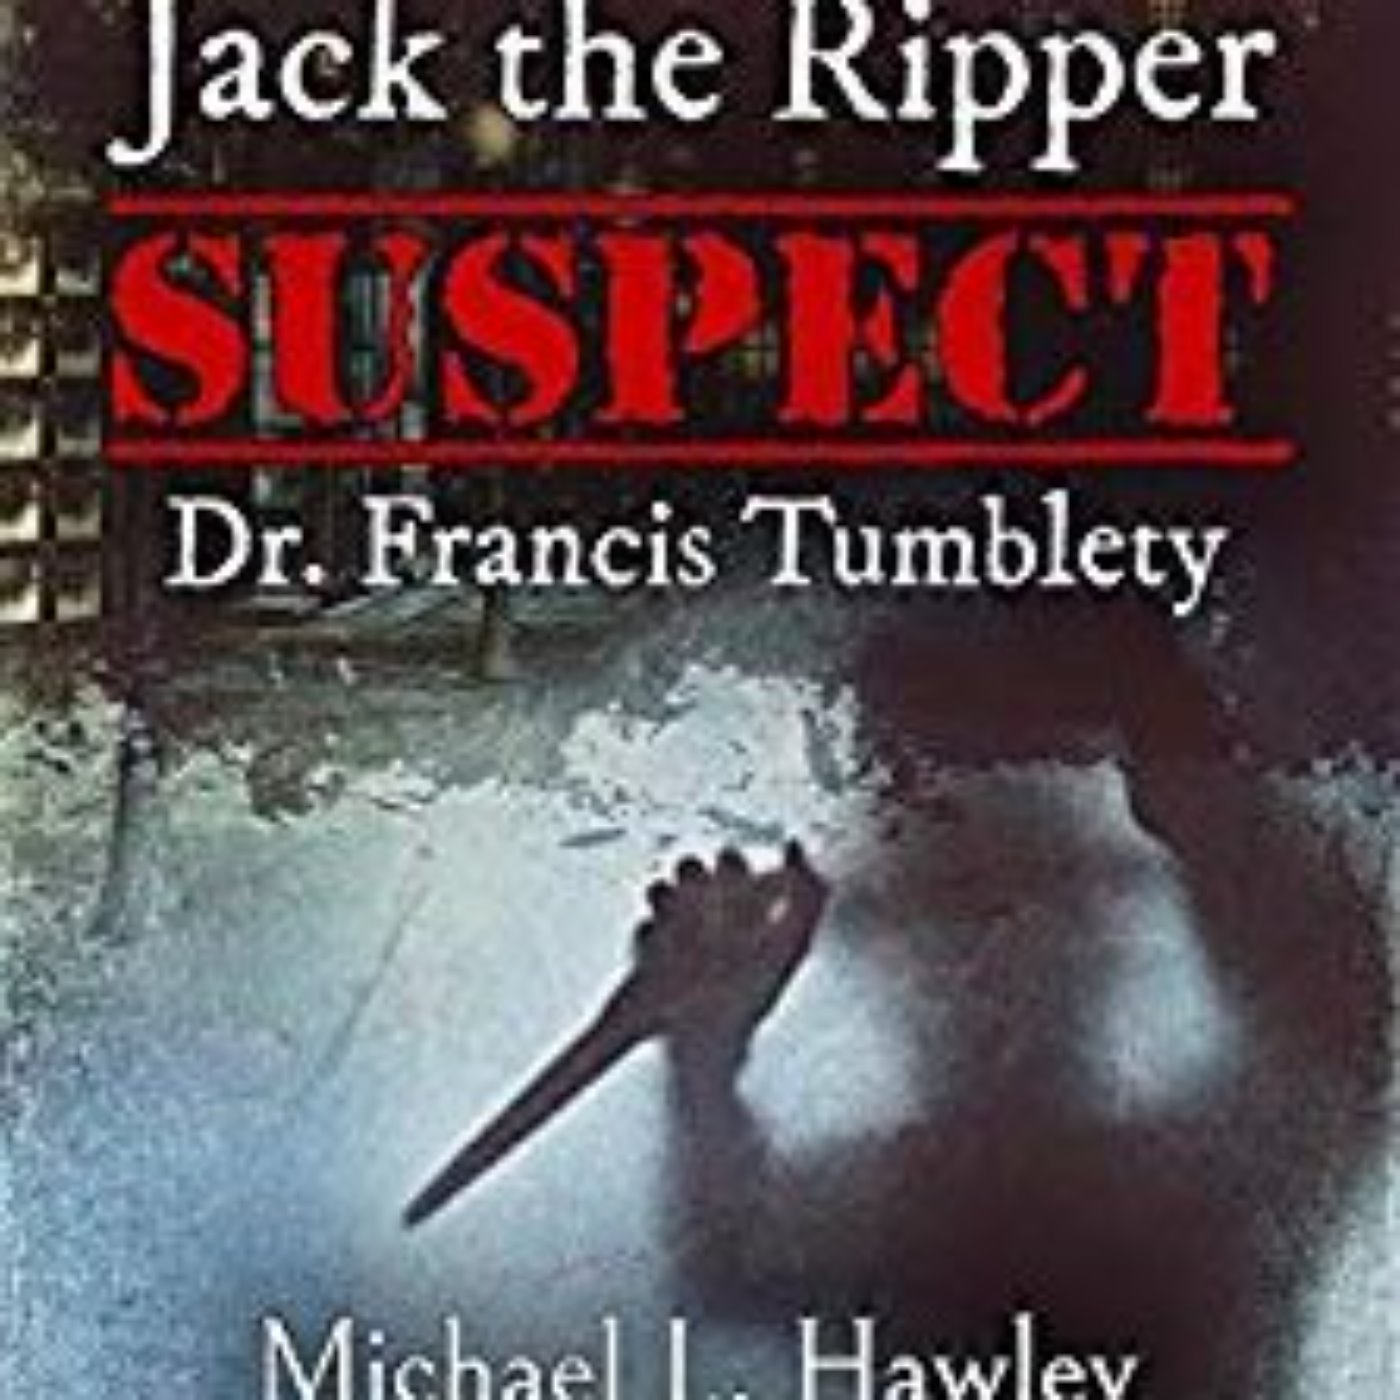 MICHAEL HAWLEY - JTR SUSPECT DR. FRANCIS TUMBLETY